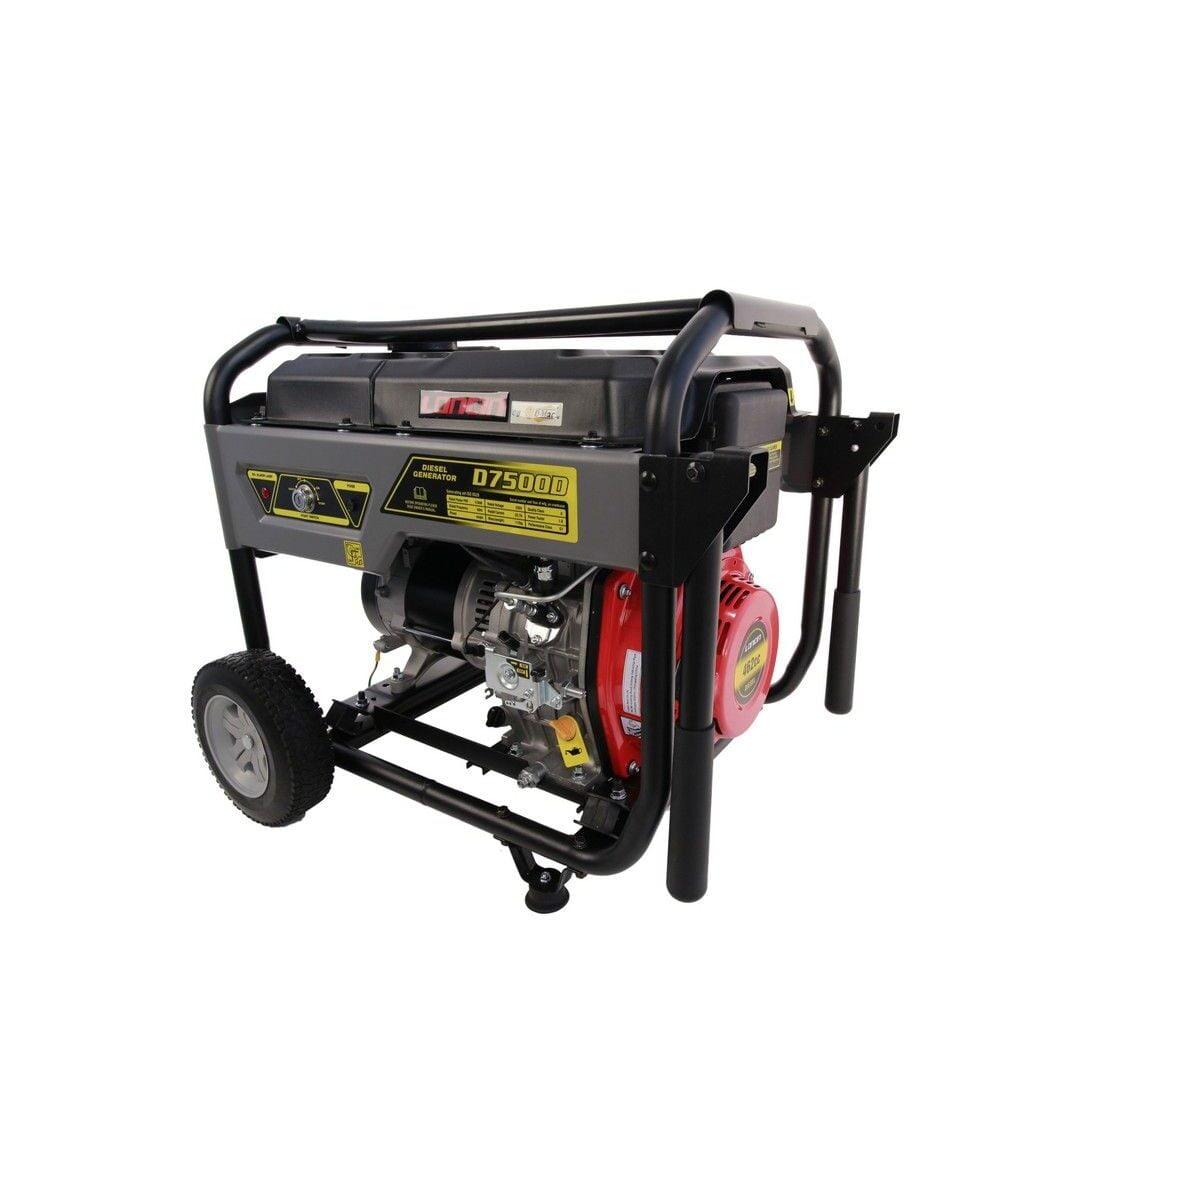 lcd7500d generator loncin 6 0kw 220v diesel o mac.ro 6